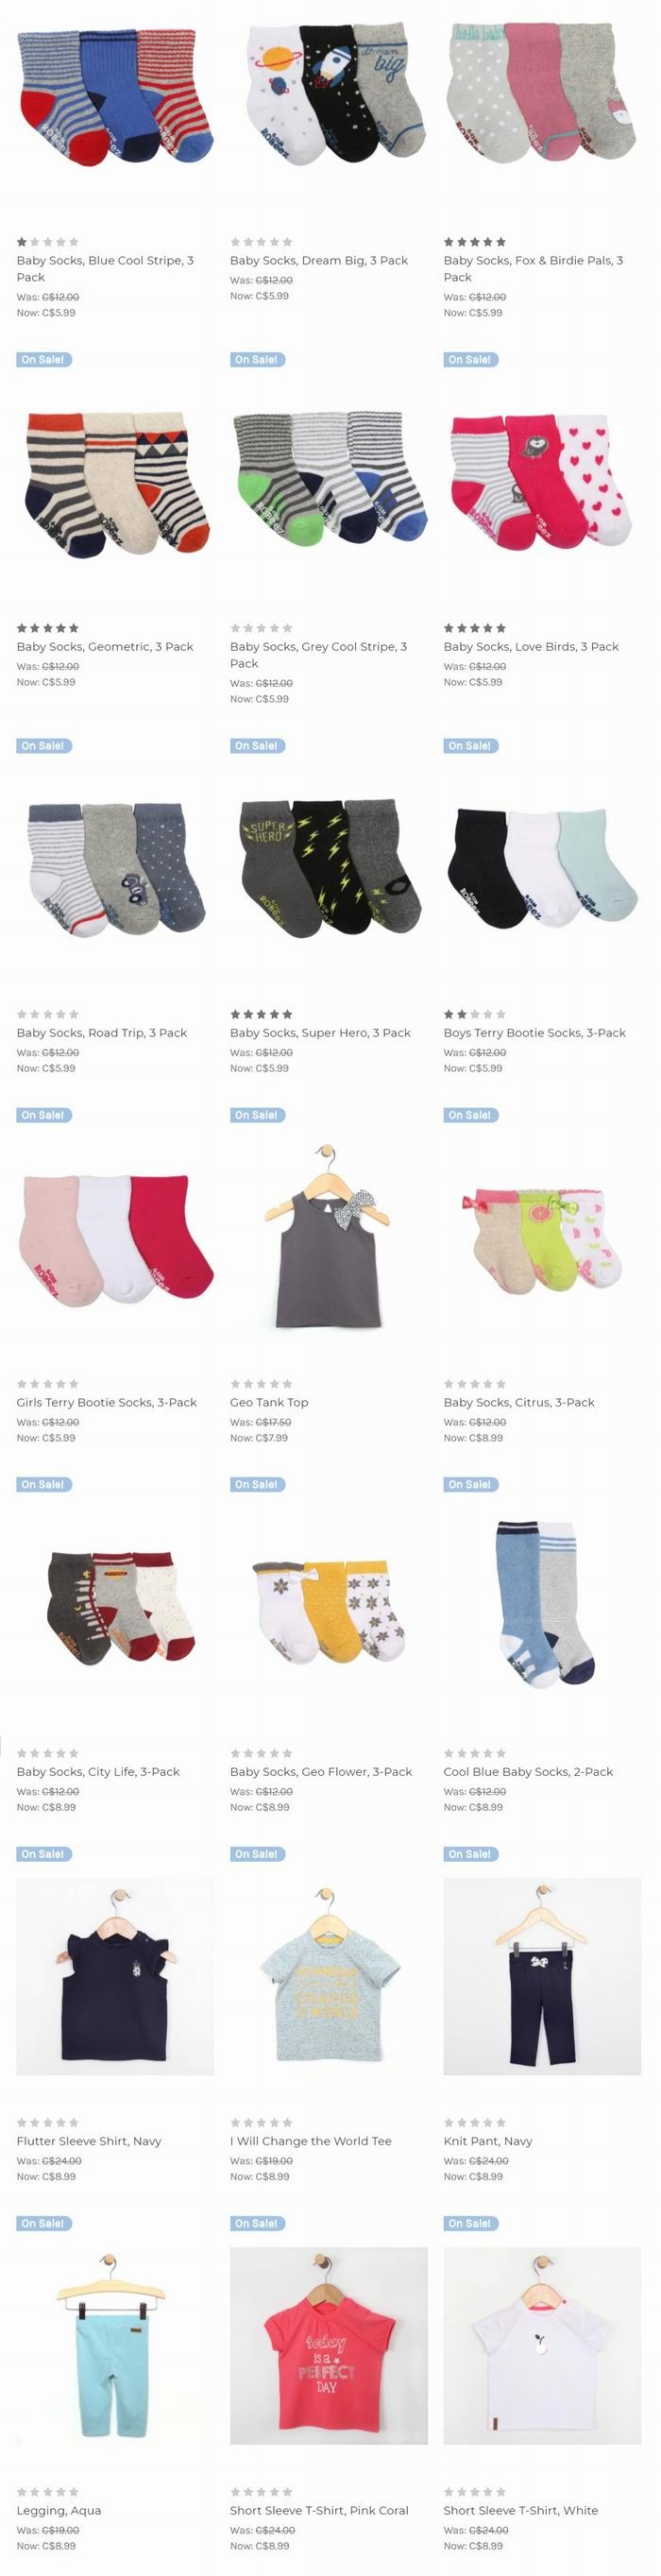 Robeez 婴儿学步鞋、袜子、服饰 5折起特卖!